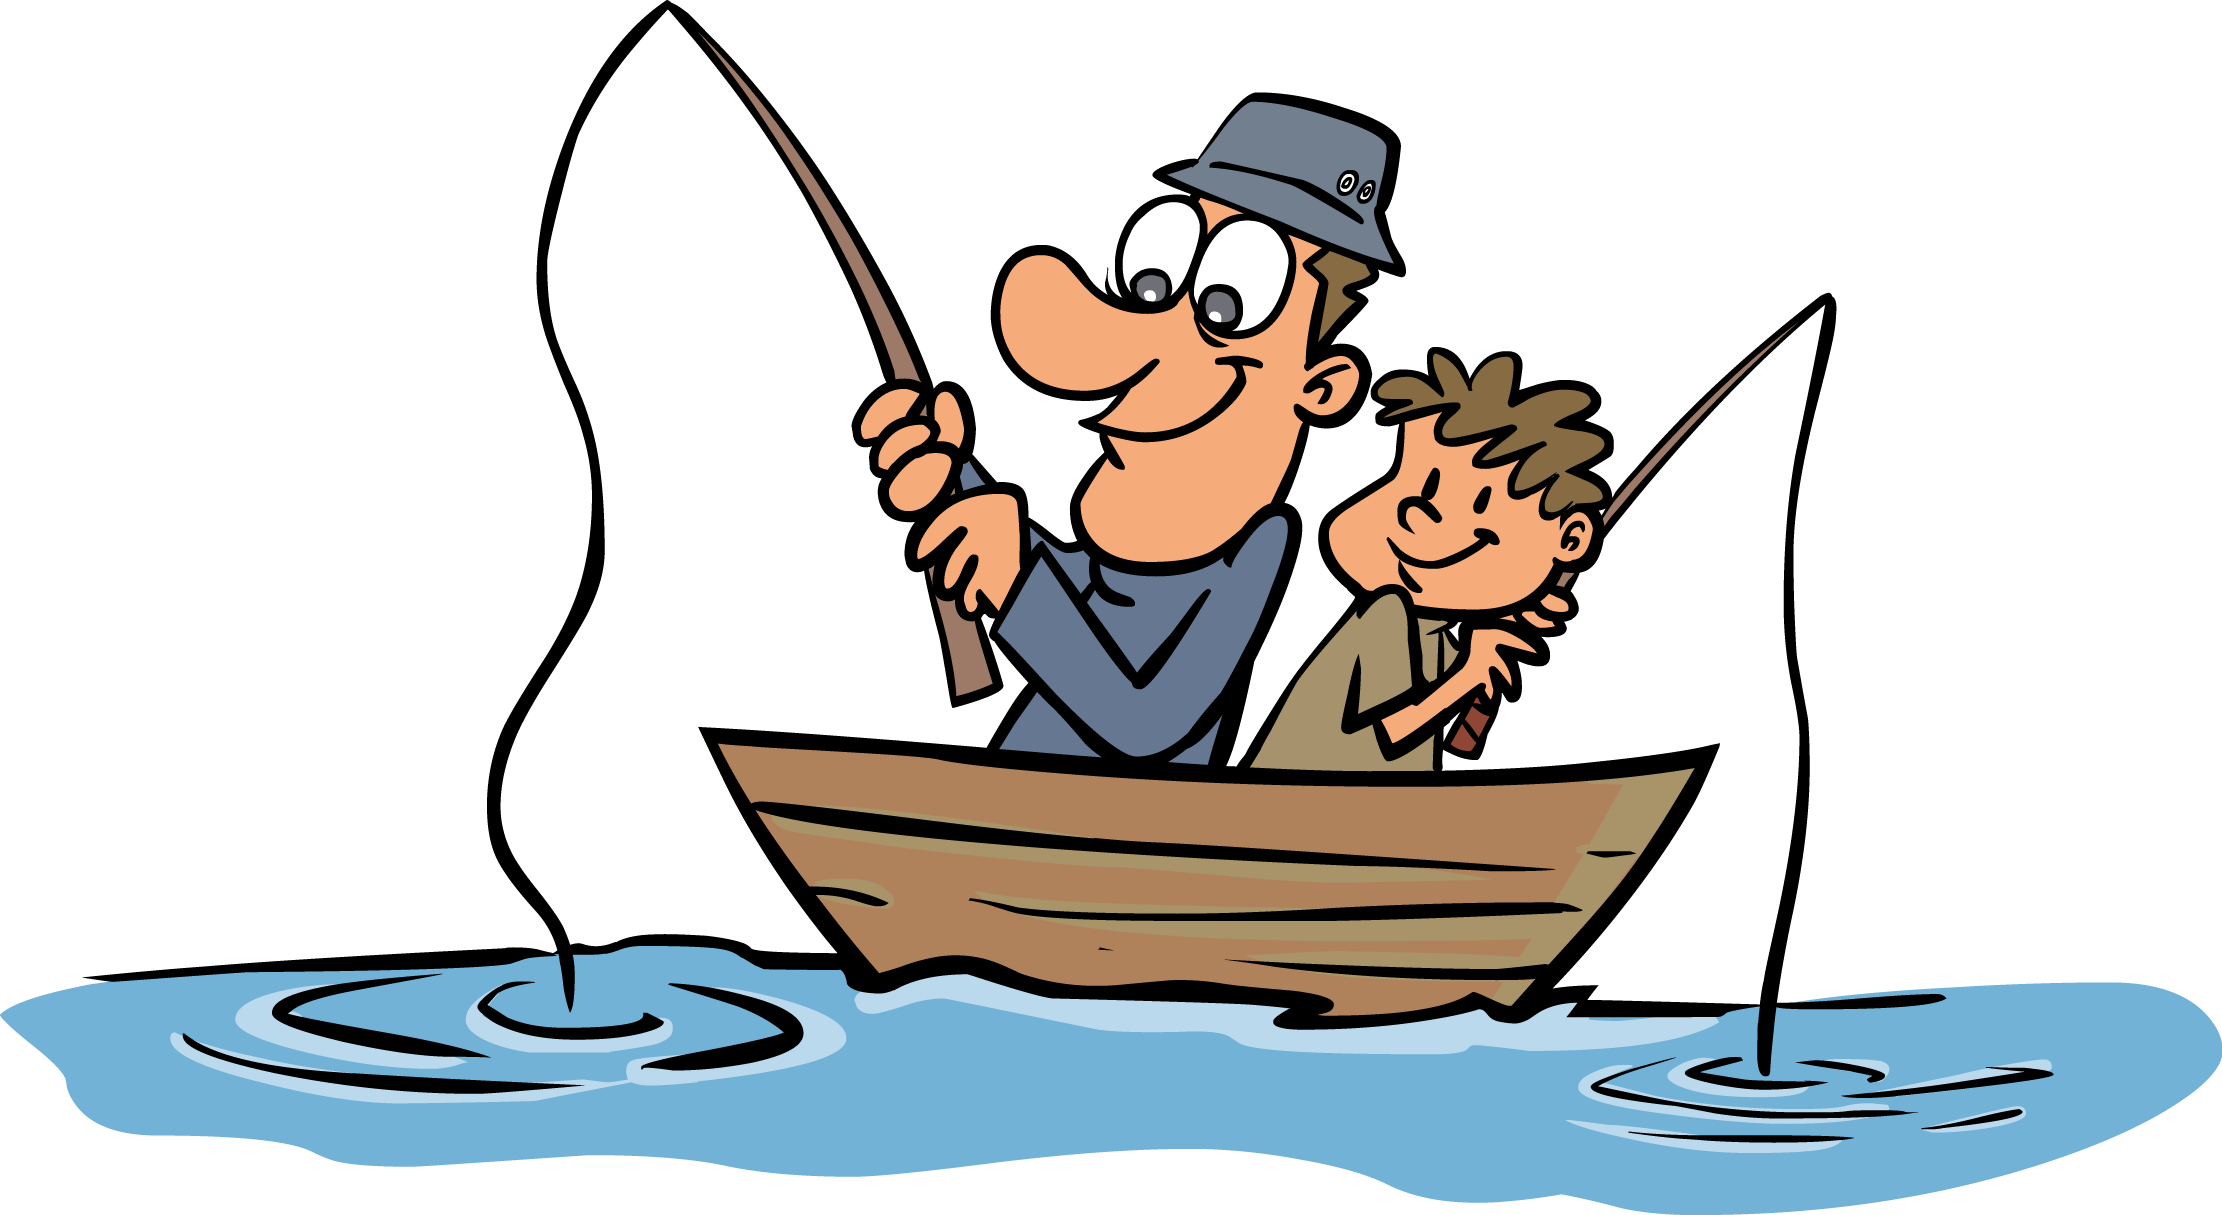 Free Cartoon Fishing, Download Free Clip Art, Free Clip Art.